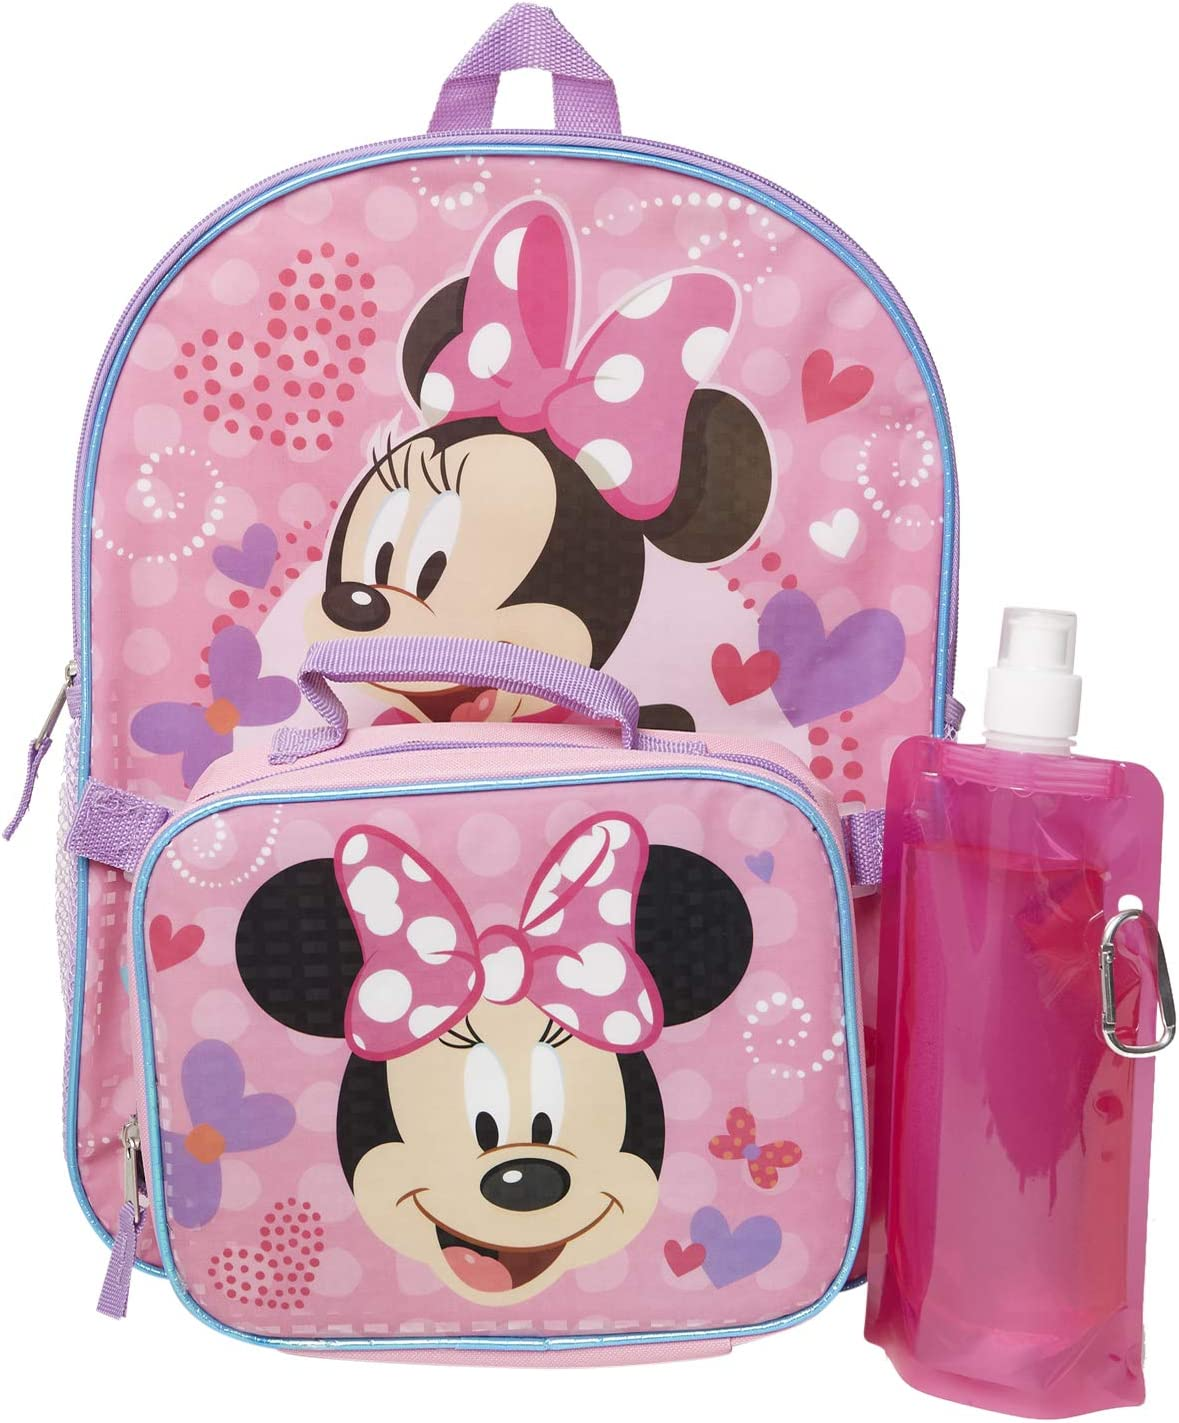 DISNEY PRINCESS MINNIE MOUSE GIRLS CARTOON SCHOOL NURSERY BAG BACKPACK LUNCH BAG